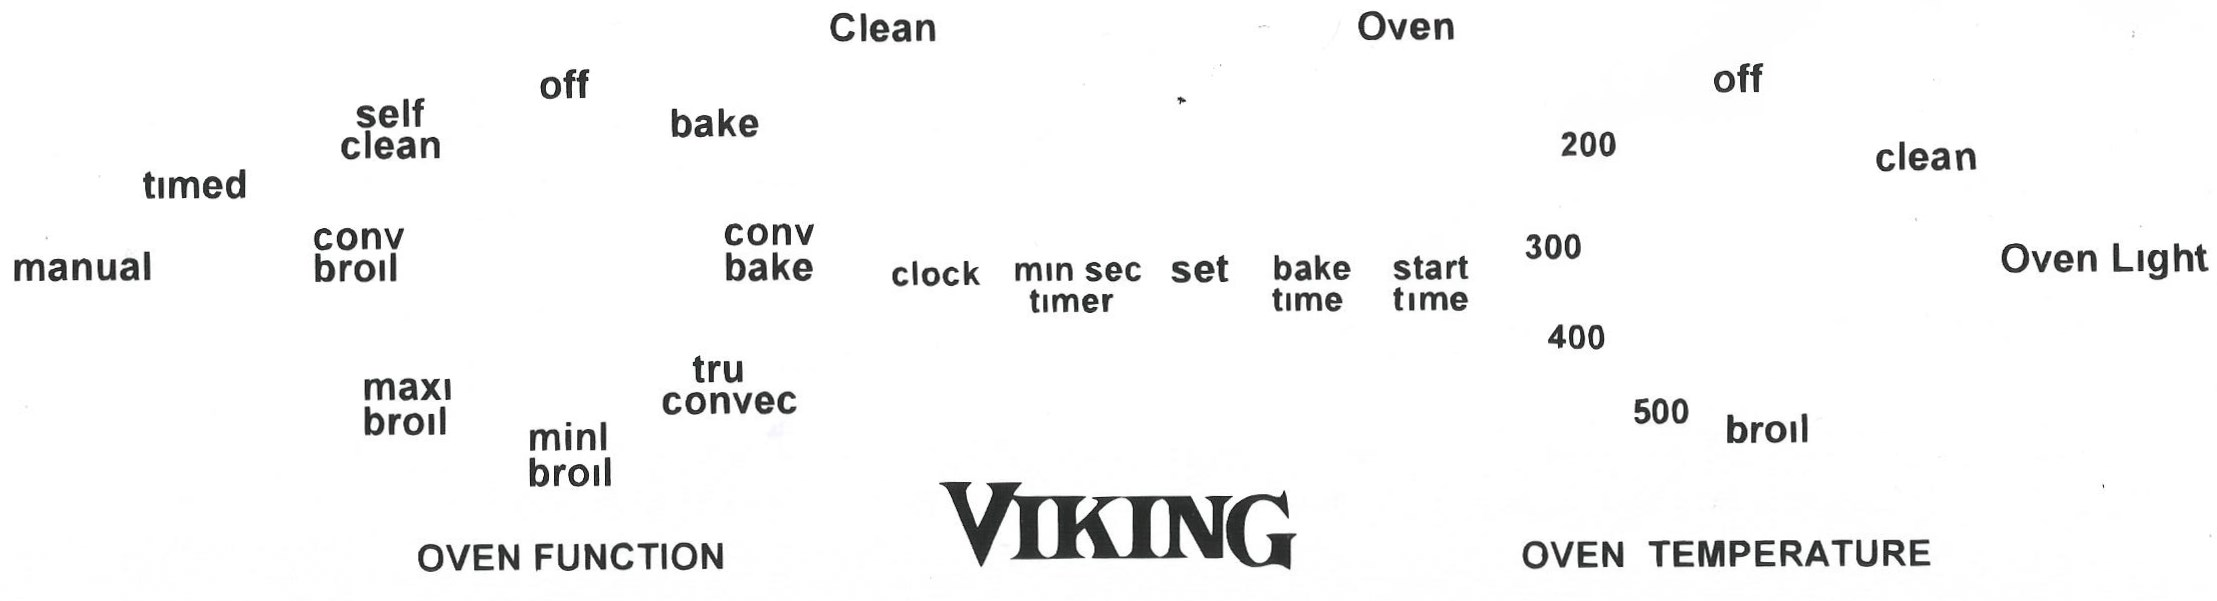 viking commercial range wiring diagram viking range fuse